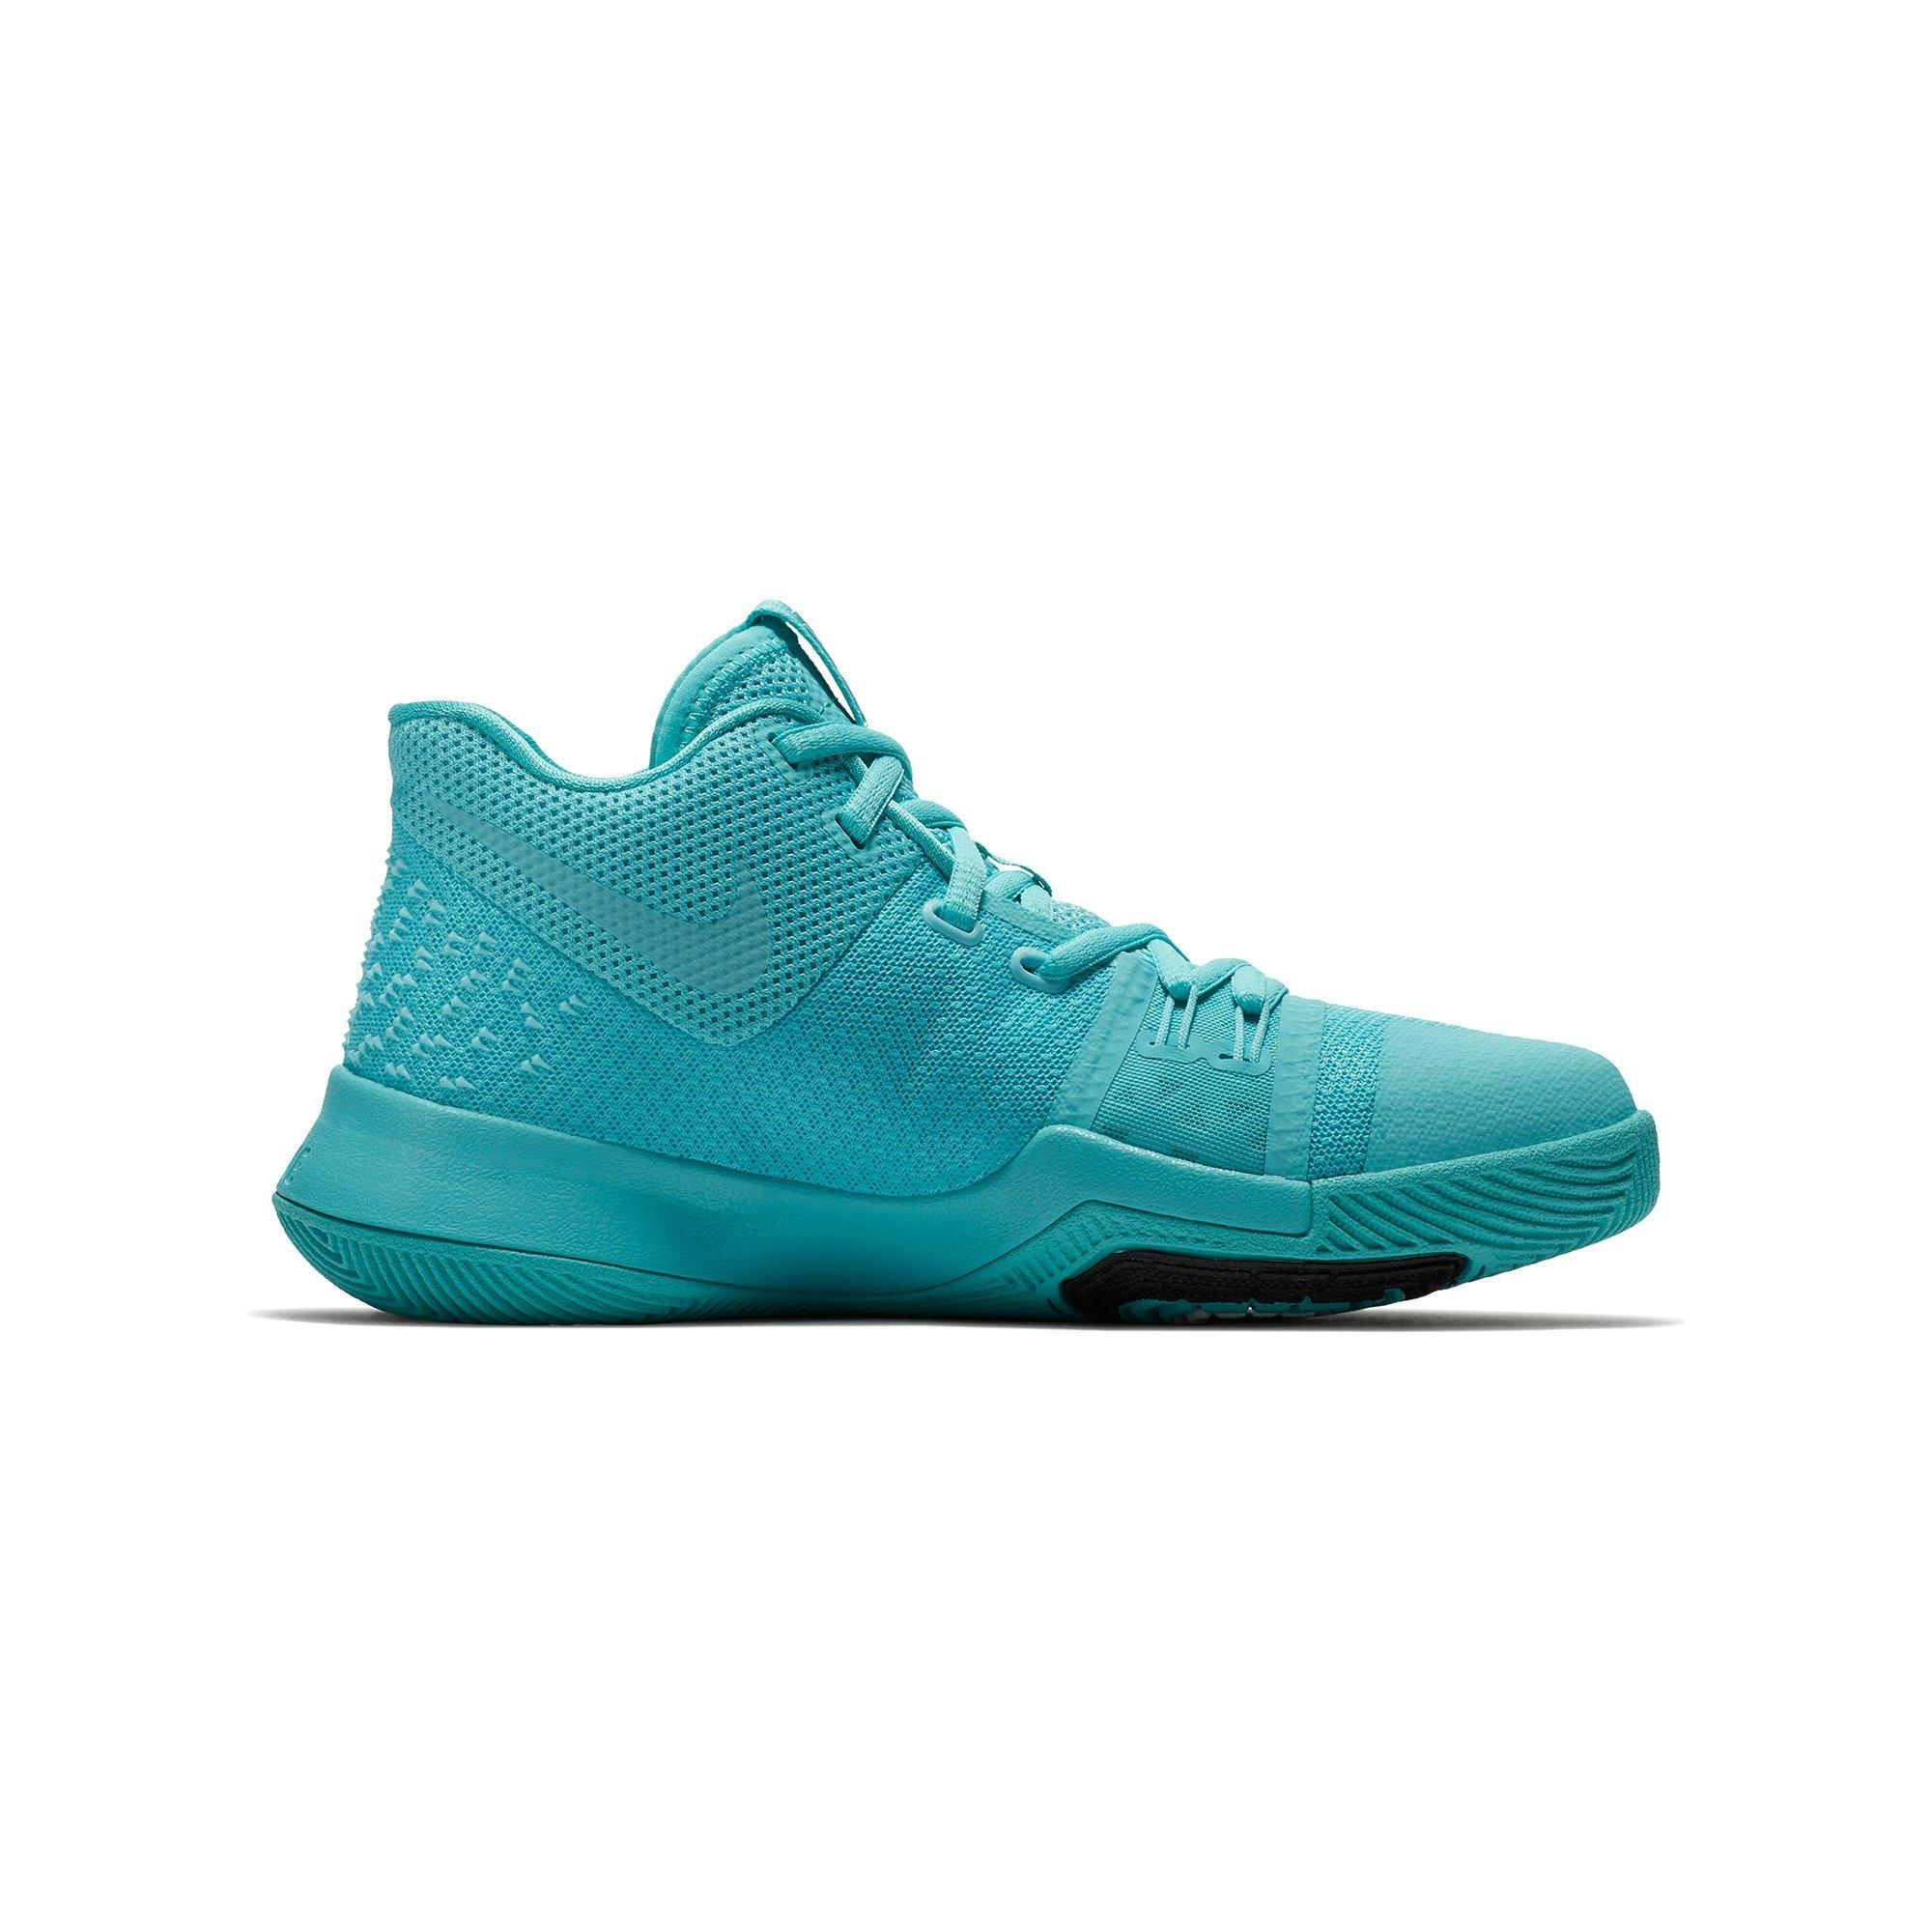 4bc4ceff86e582 Nike Jordan Mens Jordan Hydro 3 Sandal Shoes Black Jordan Hydro 3 ...